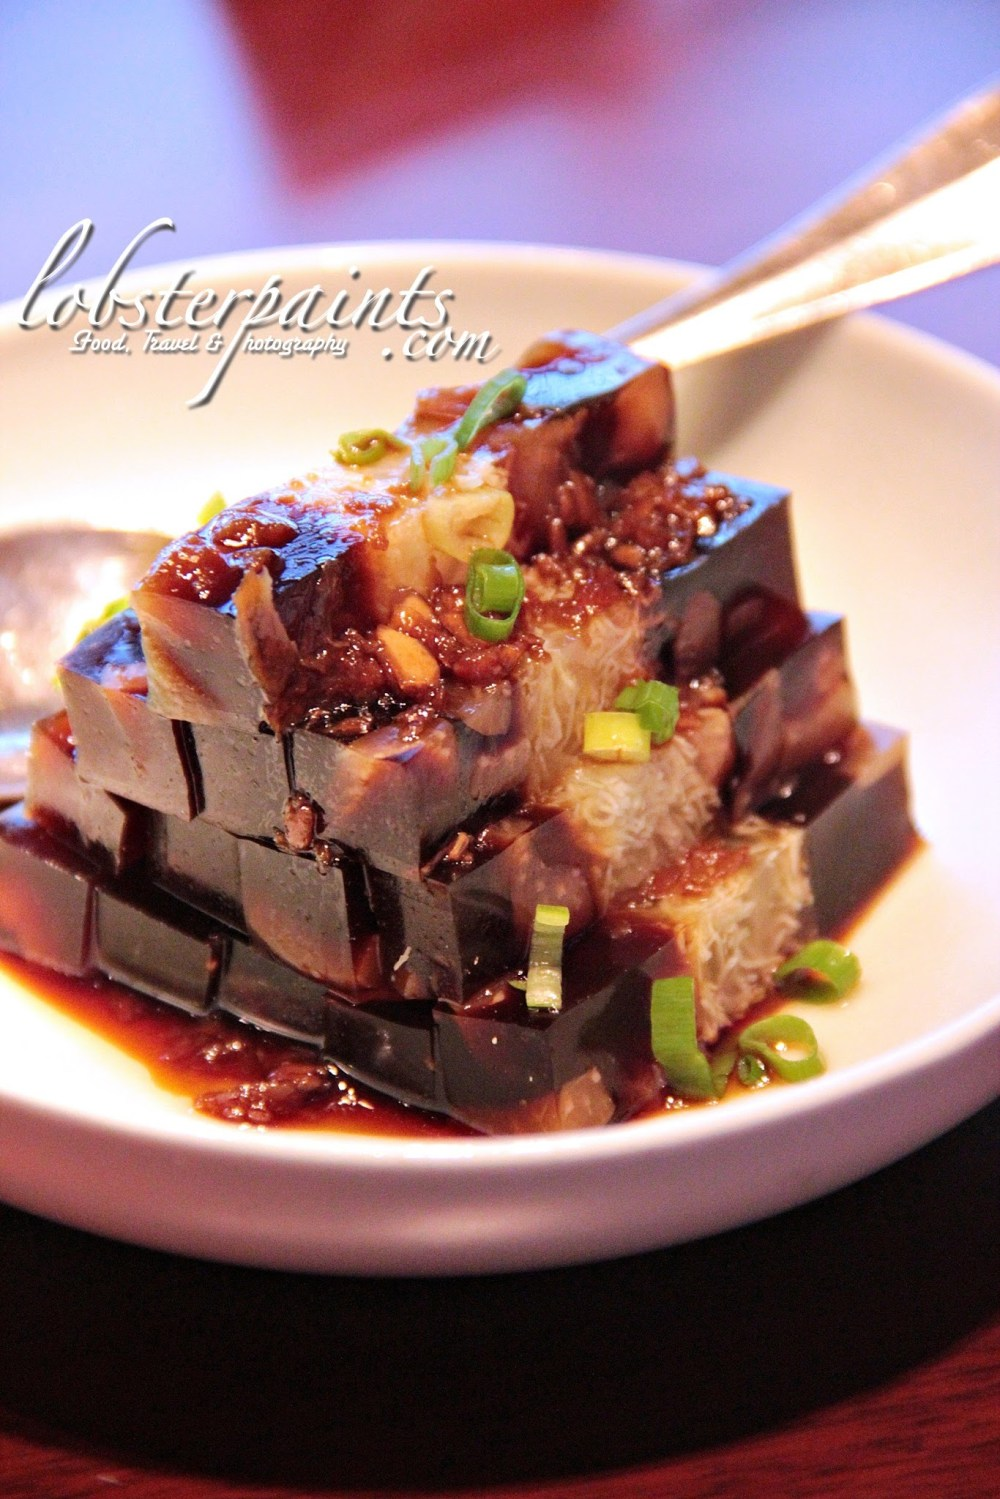 Pork and Crab Meat Terrine 京味蟹肉皮冻 @ Beijing Kitchen 滿堂彩 | Grand Hyatt, City of Dreams, Macau